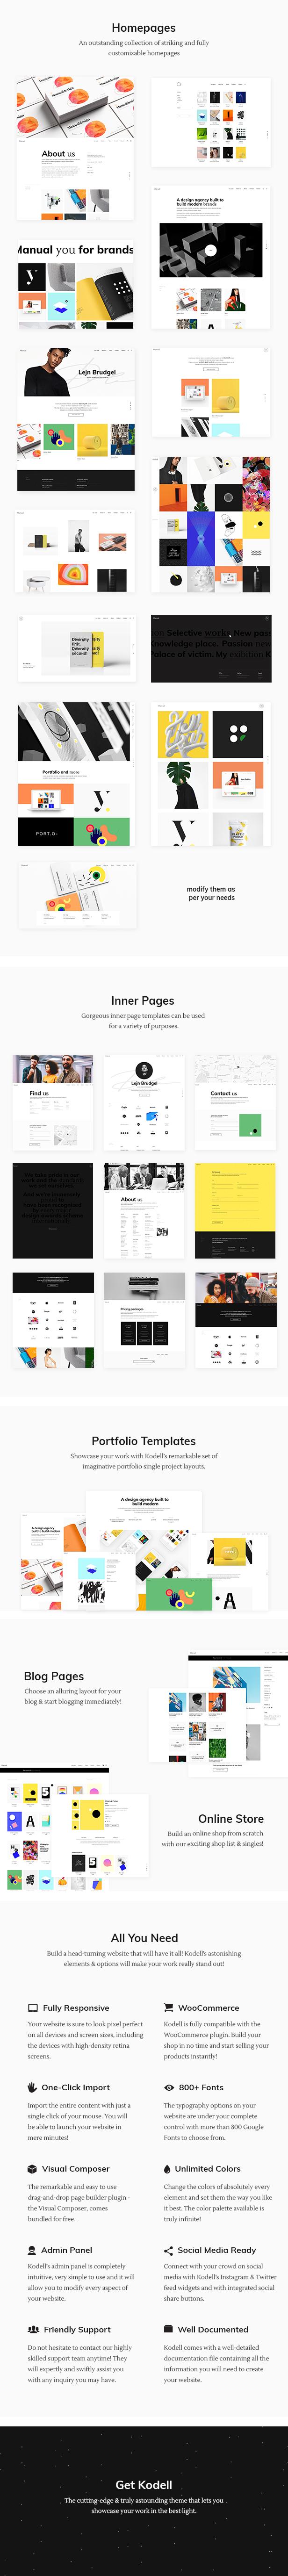 Kodell - Creative Portfolio Theme for Designers and Agencies - 1